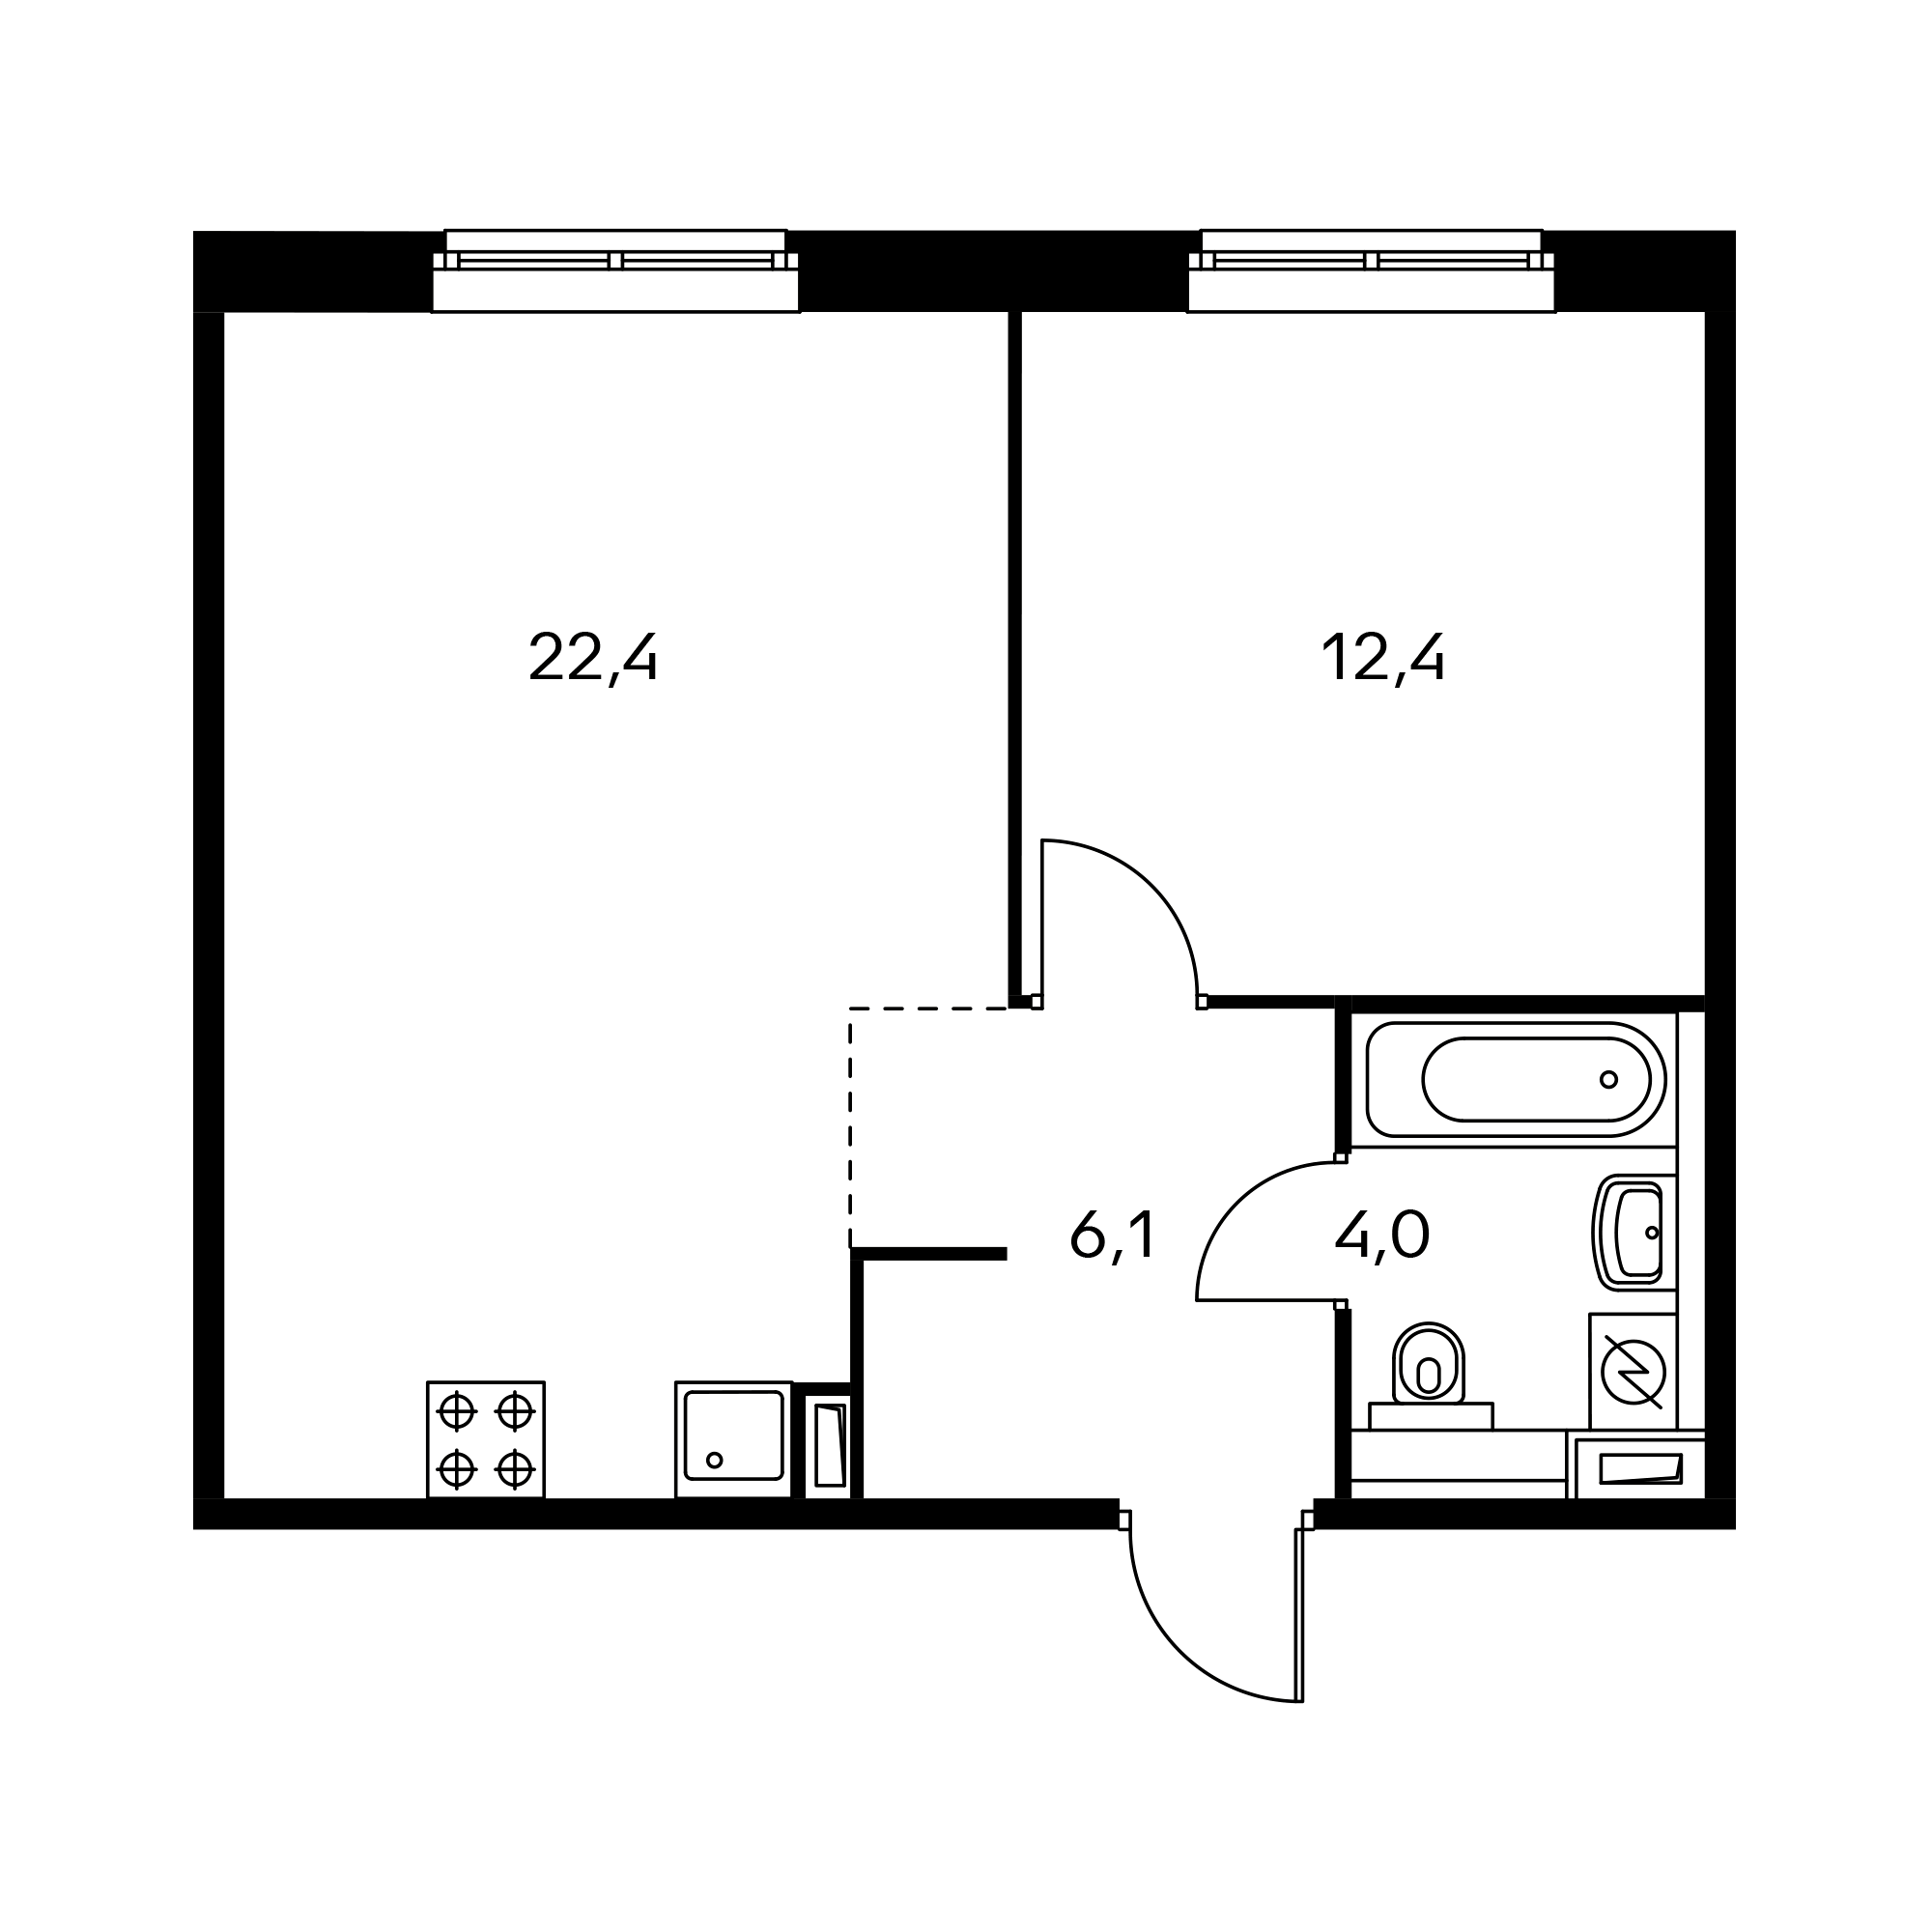 1EL3_7.8-2